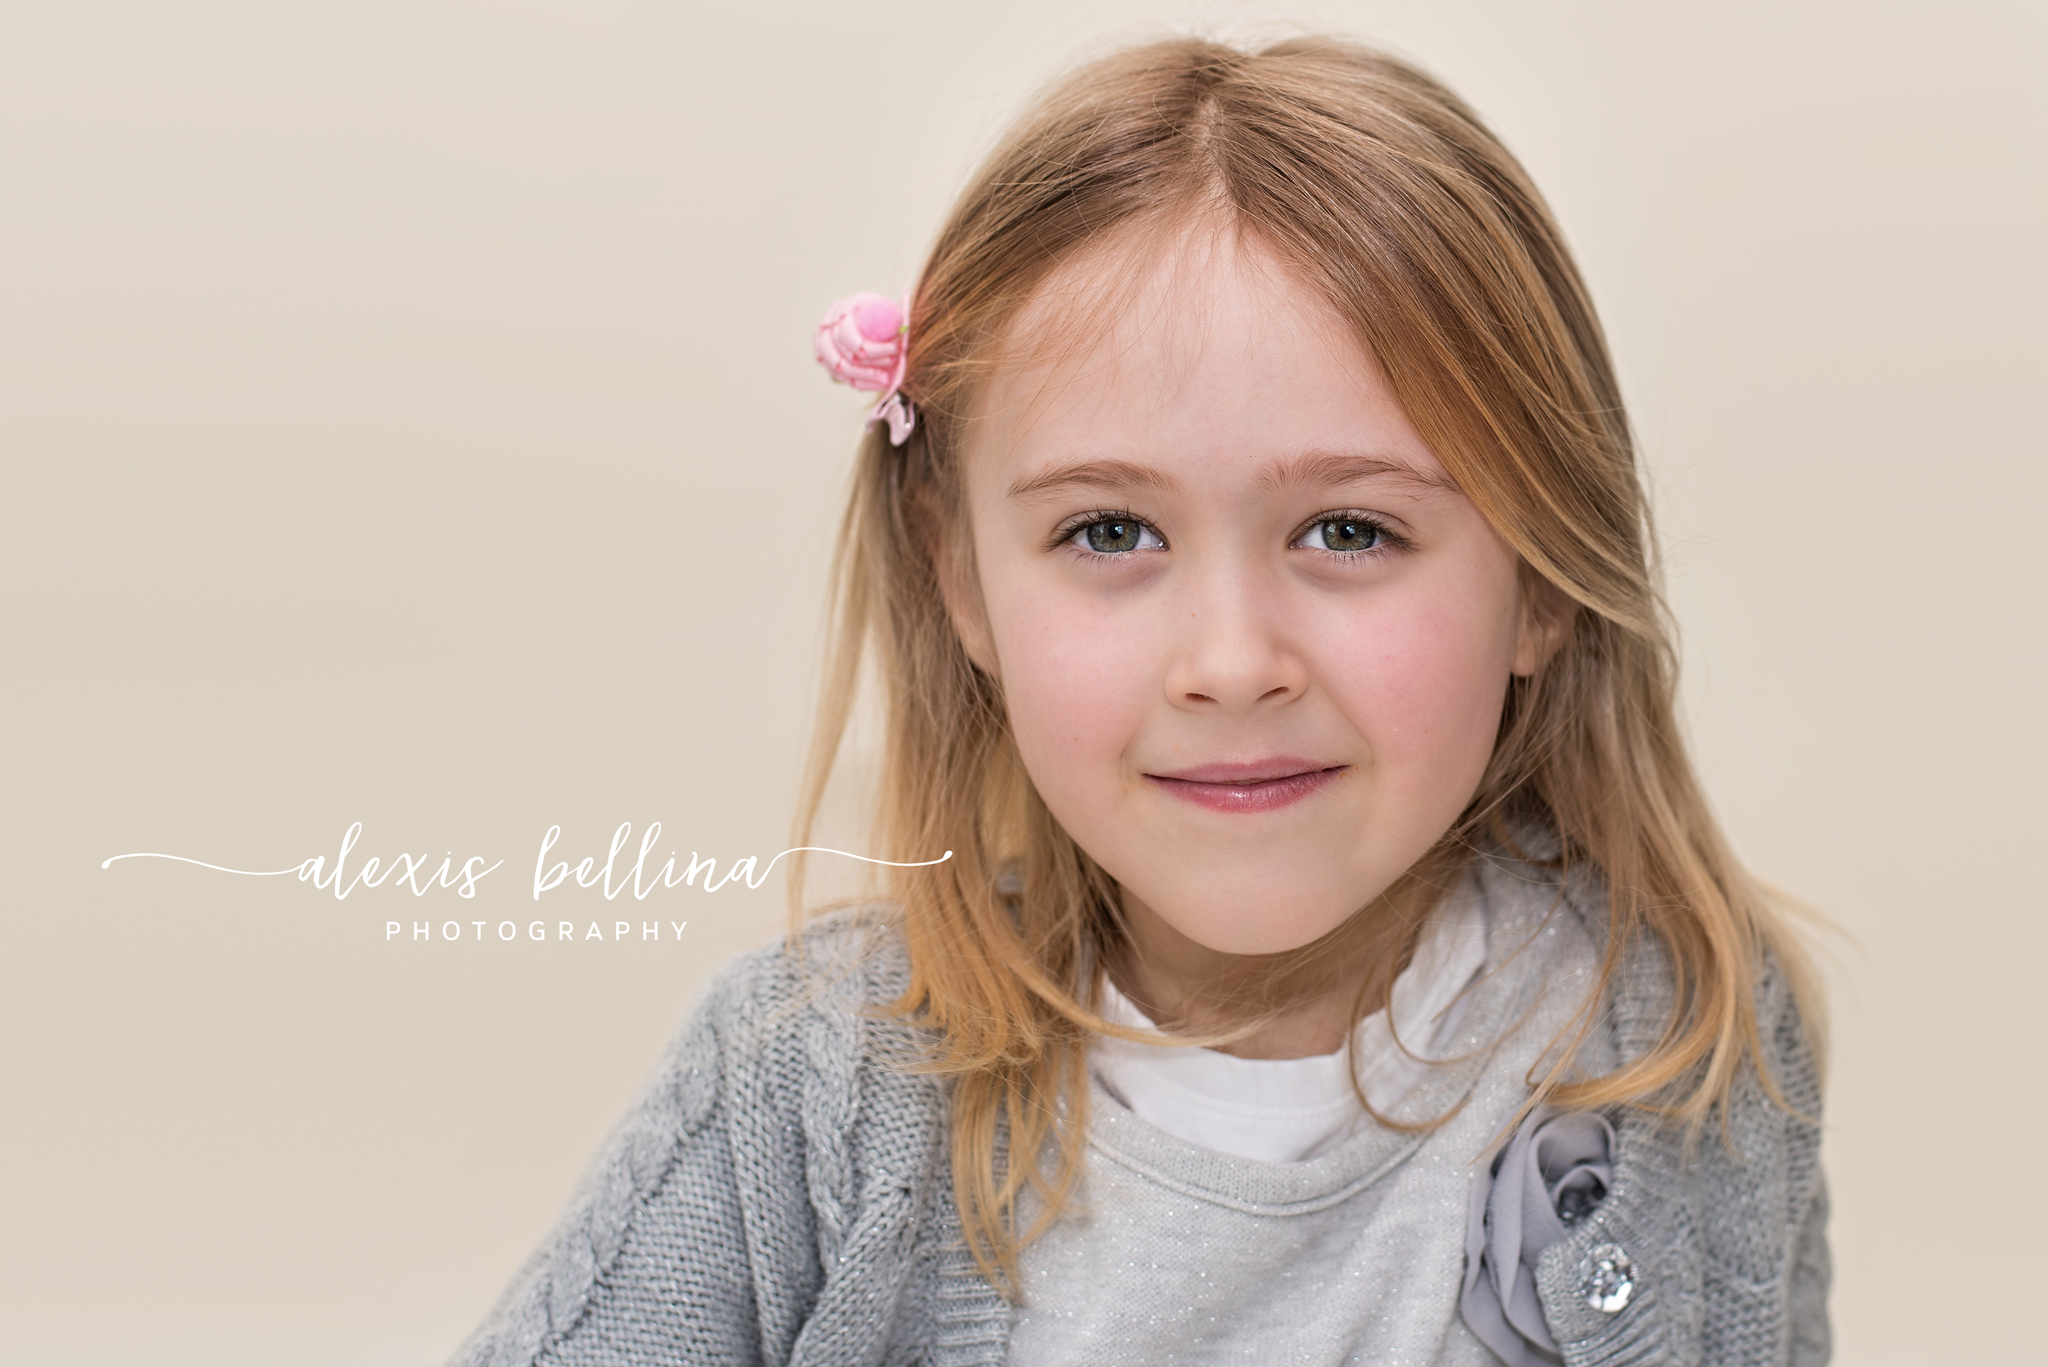 DSC_4914FBWatermark Softening of Children's Images with MCP Newborn Necessities